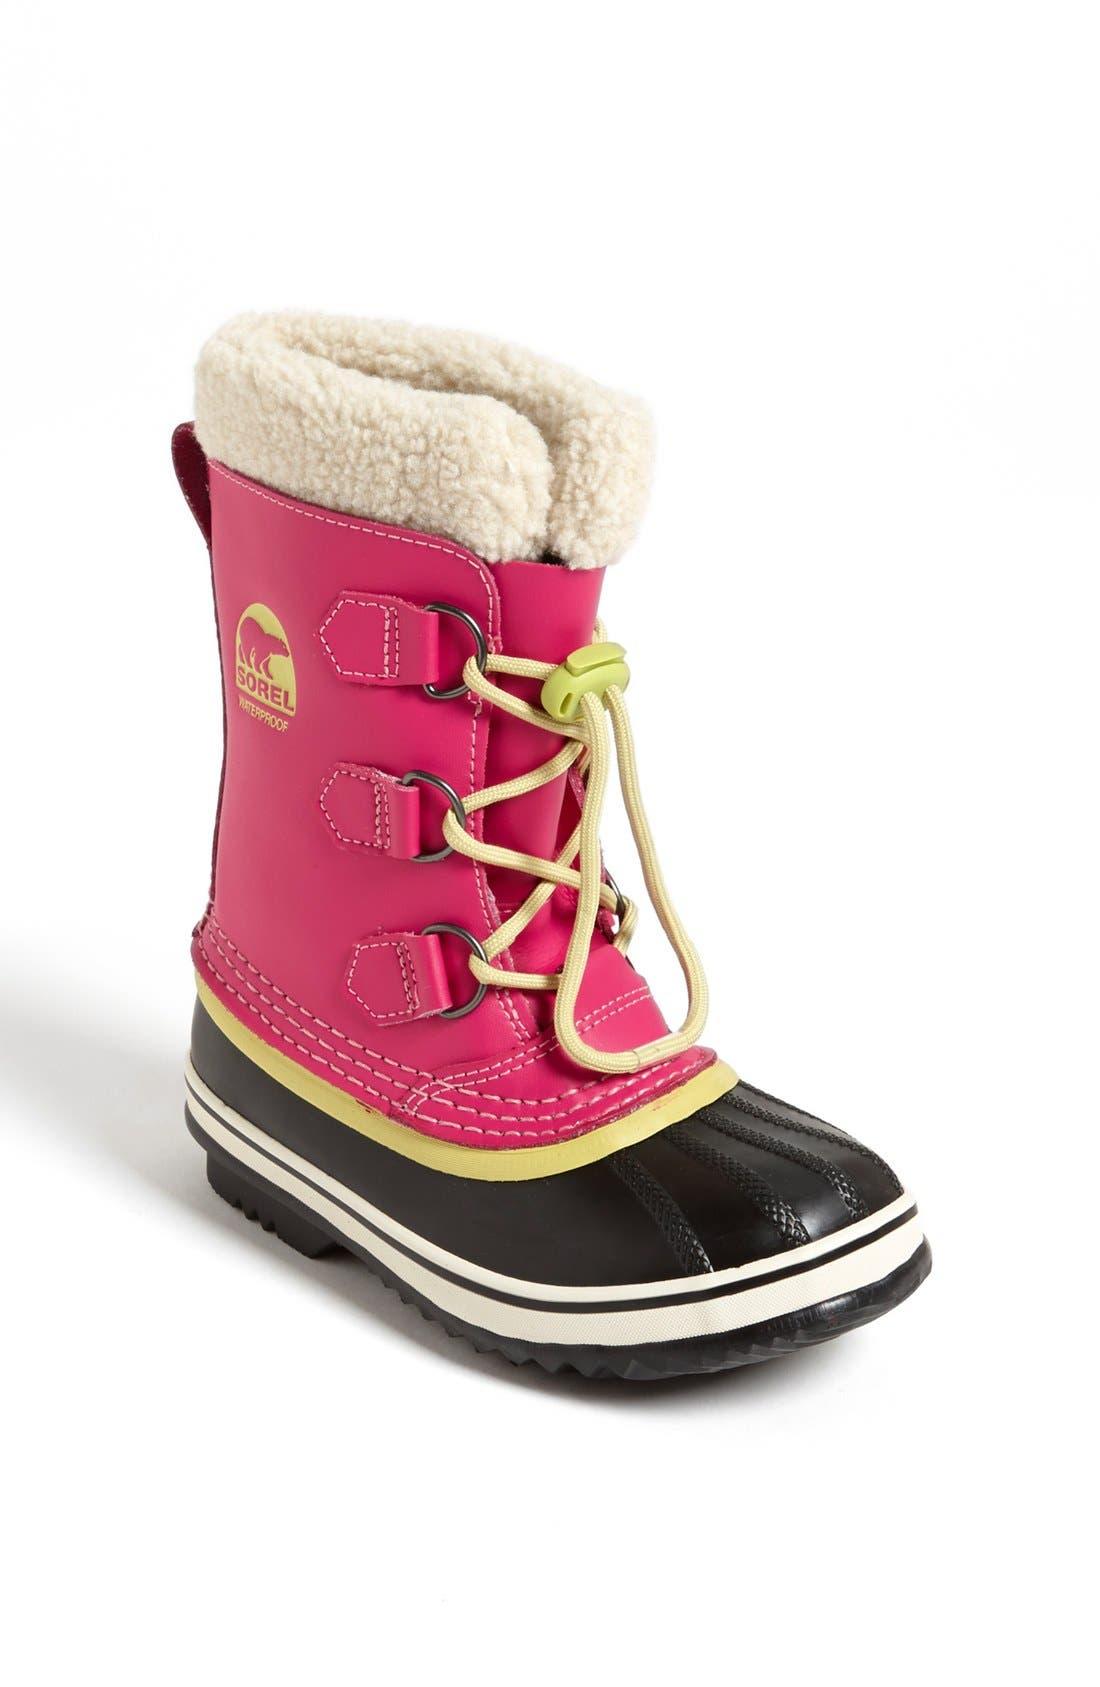 Main Image - SOREL 'Yoot Pac' Weatherproof Boot (Toddler, Little Kid & Big Kid)